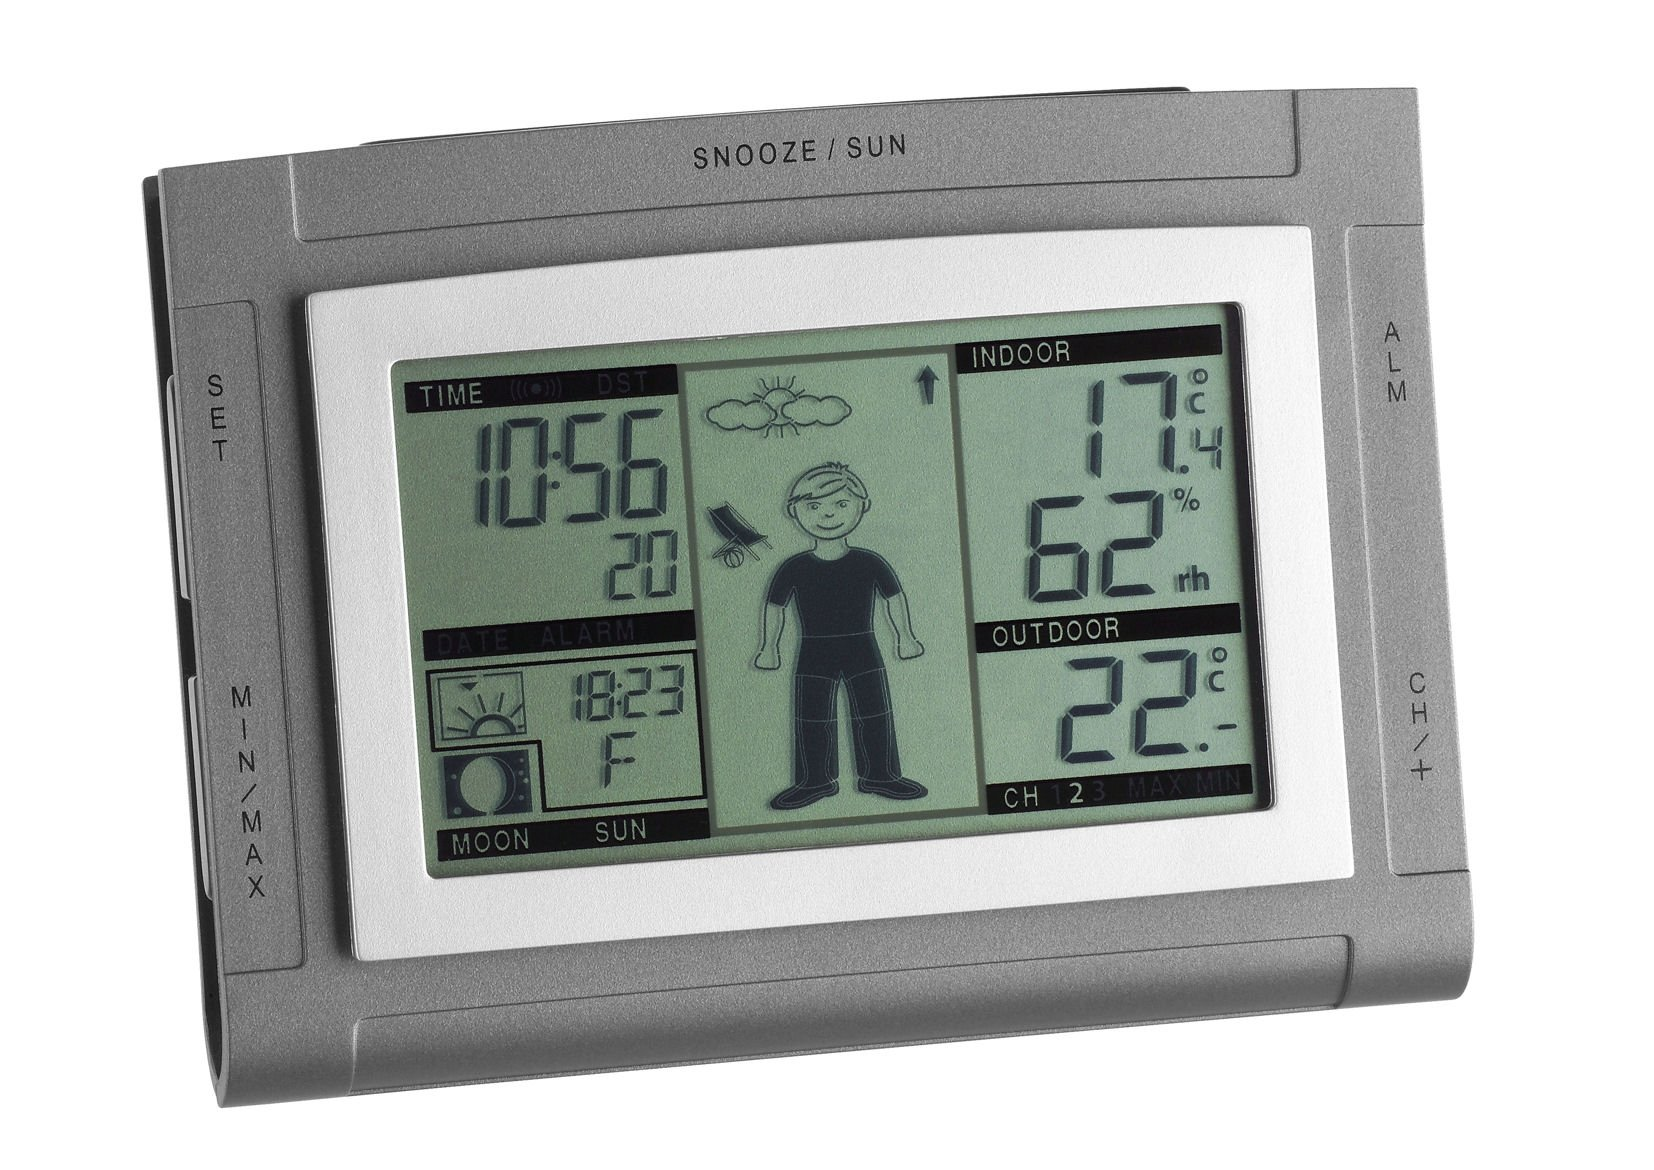 tfa dostmann elektronische wetterstation weatherboy xs 35. Black Bedroom Furniture Sets. Home Design Ideas